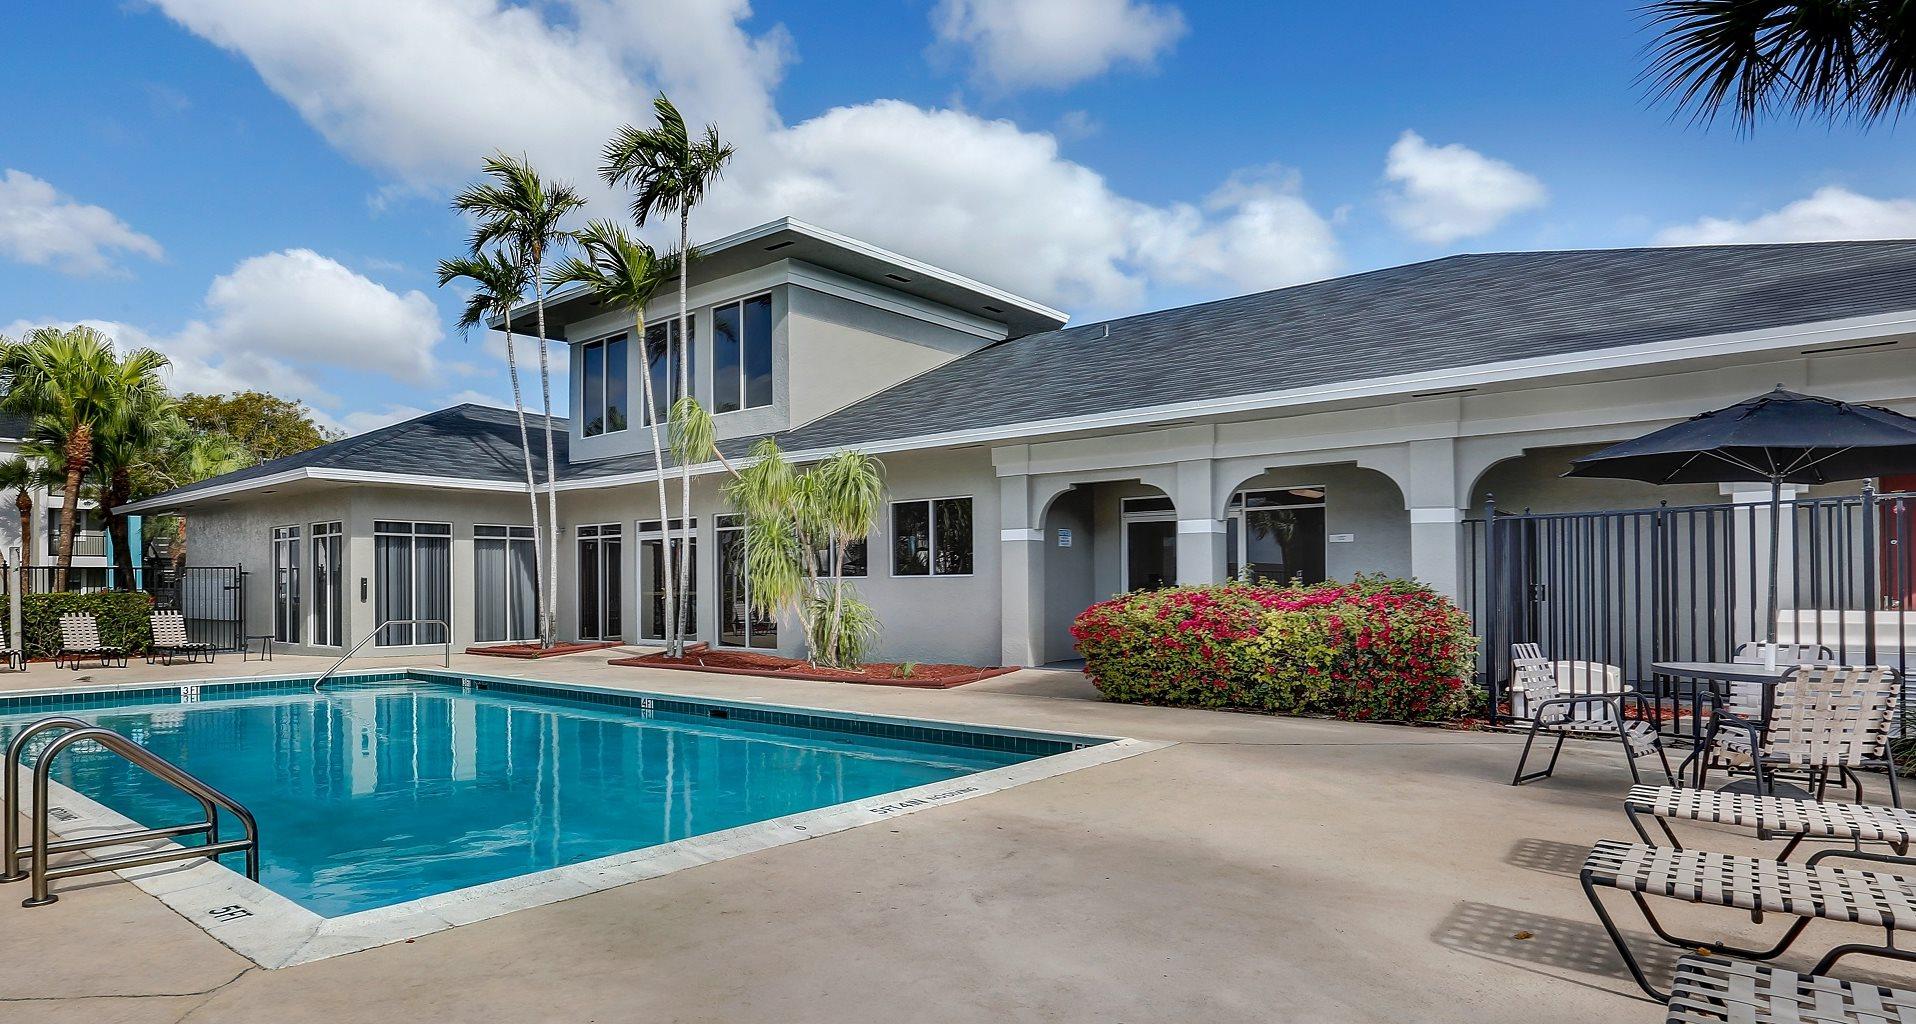 Villa Biscayne Apartment Homes